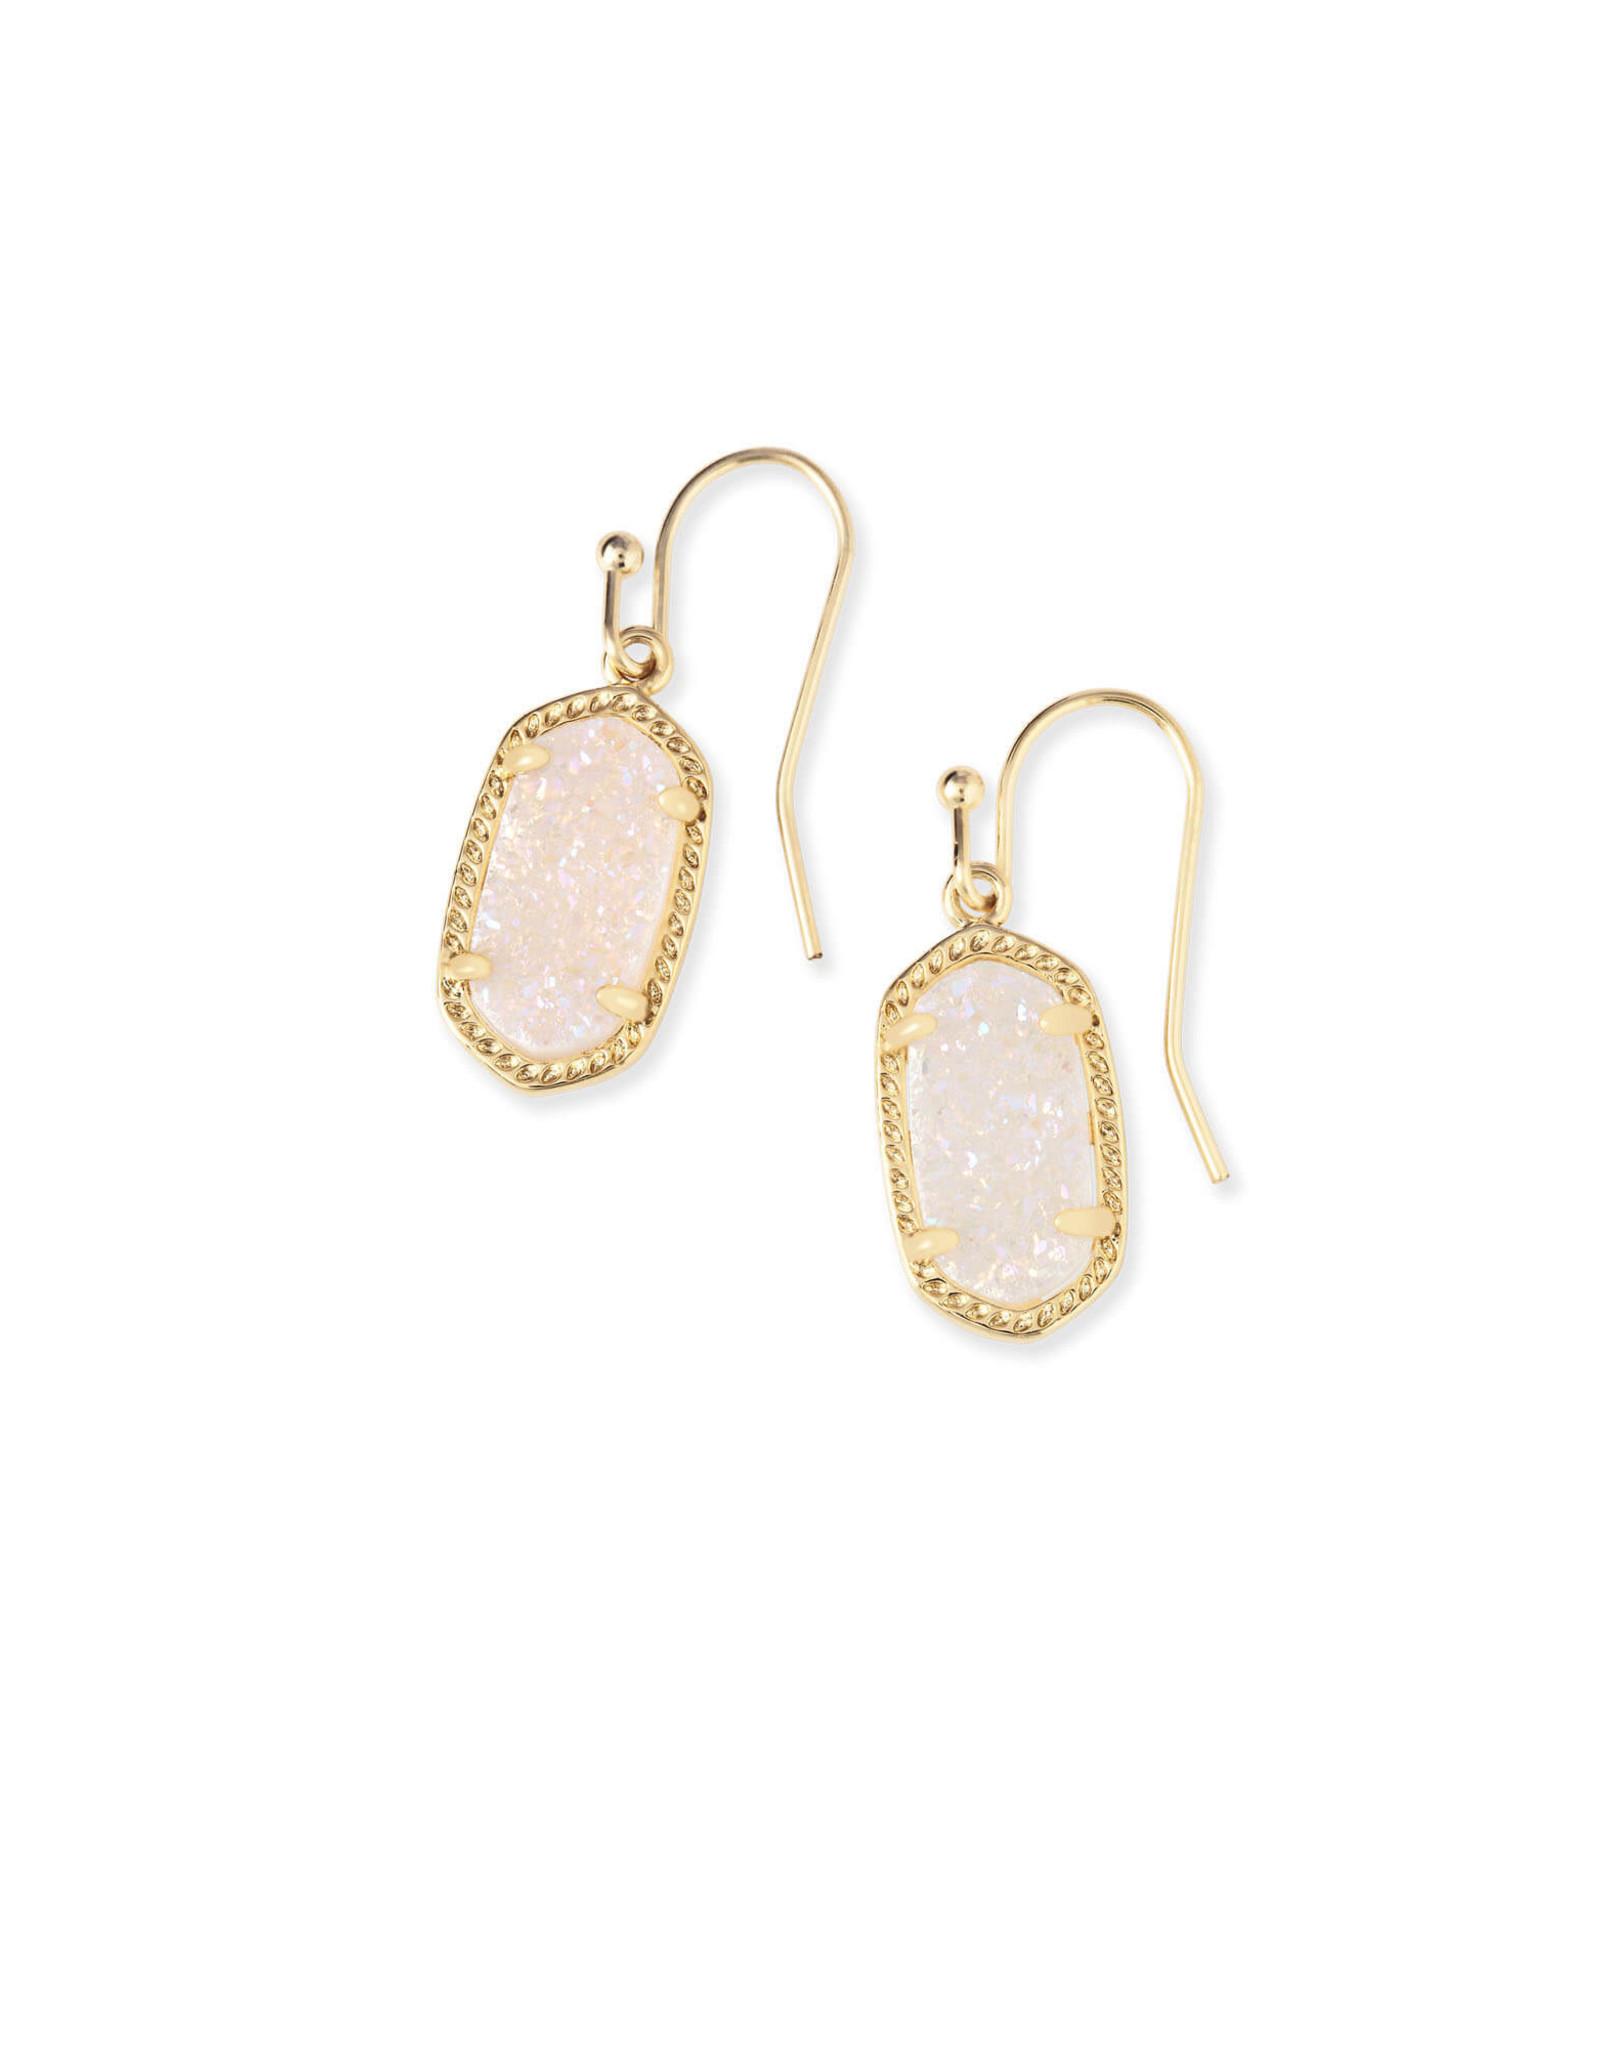 Kendra Scott Lee Earring - Iridescent Drusy/Gold